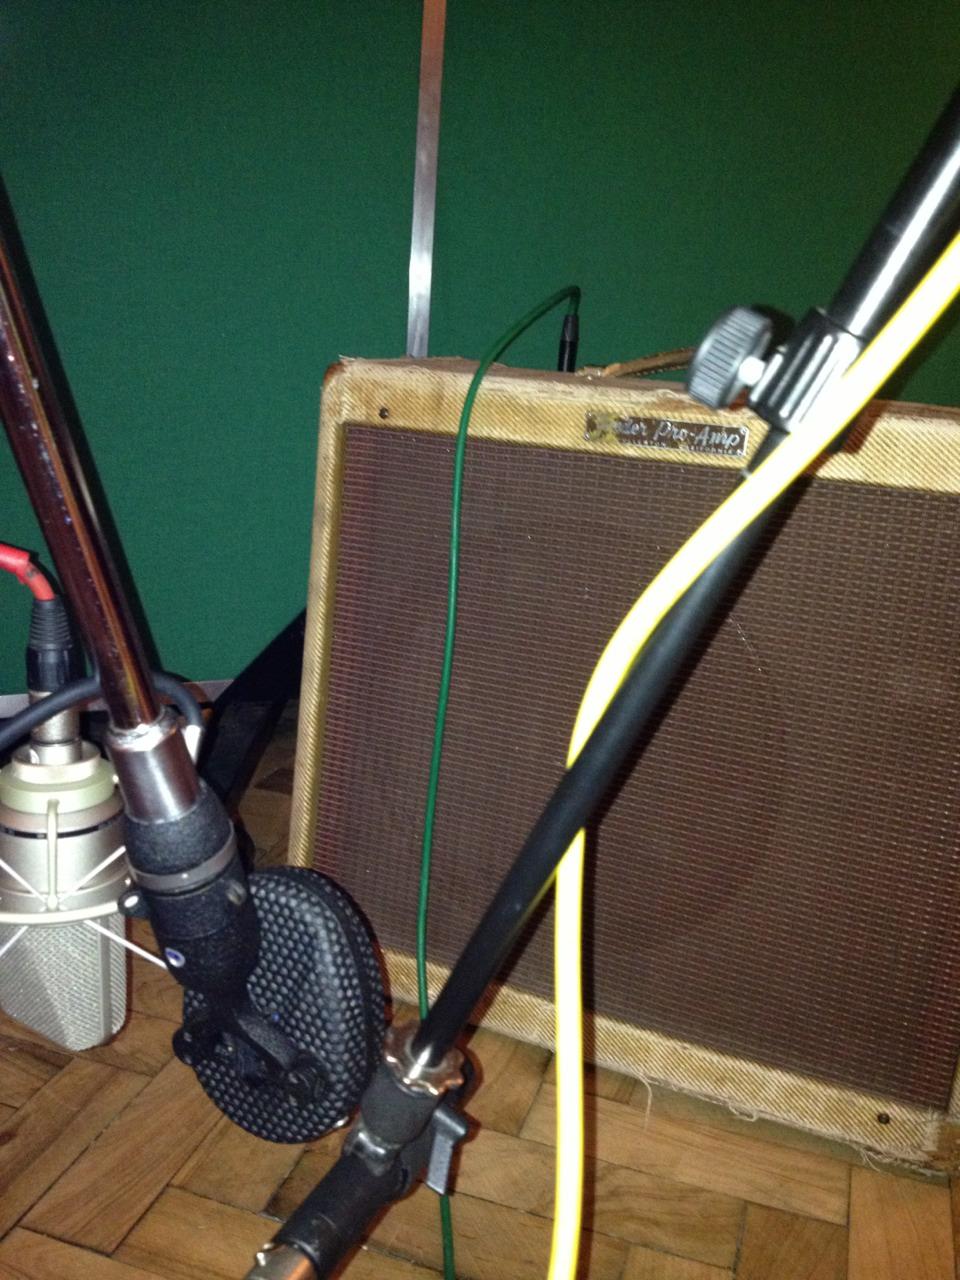 Octavia mk3-13m vs Coles vs Nuemann vs 1957 Fender amp for the lap steel. AKG 451 room mics out of shot.